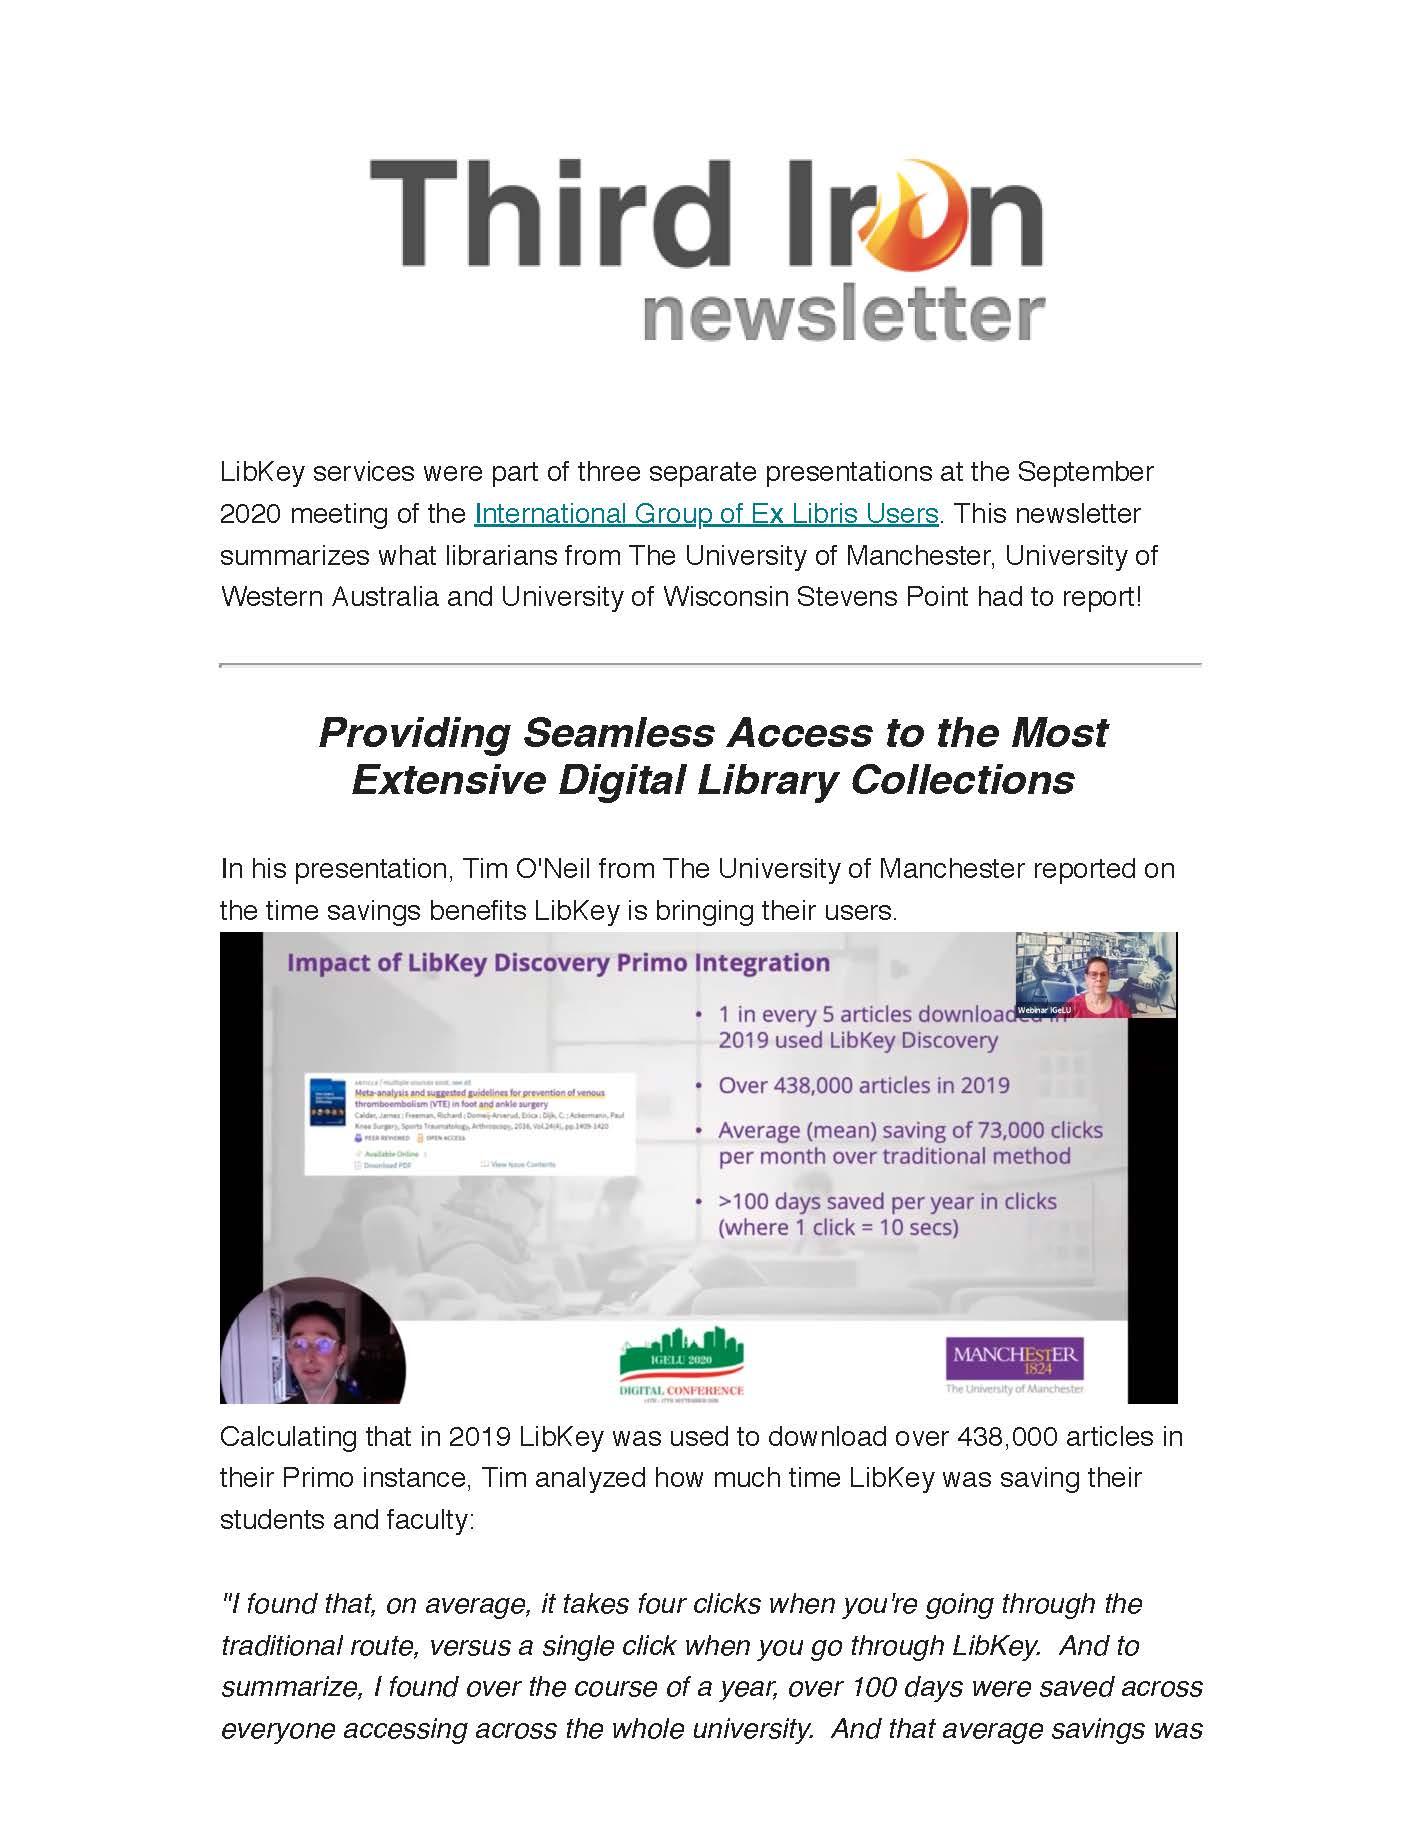 Third Iron Newsletter 10-19-2020_Page_1